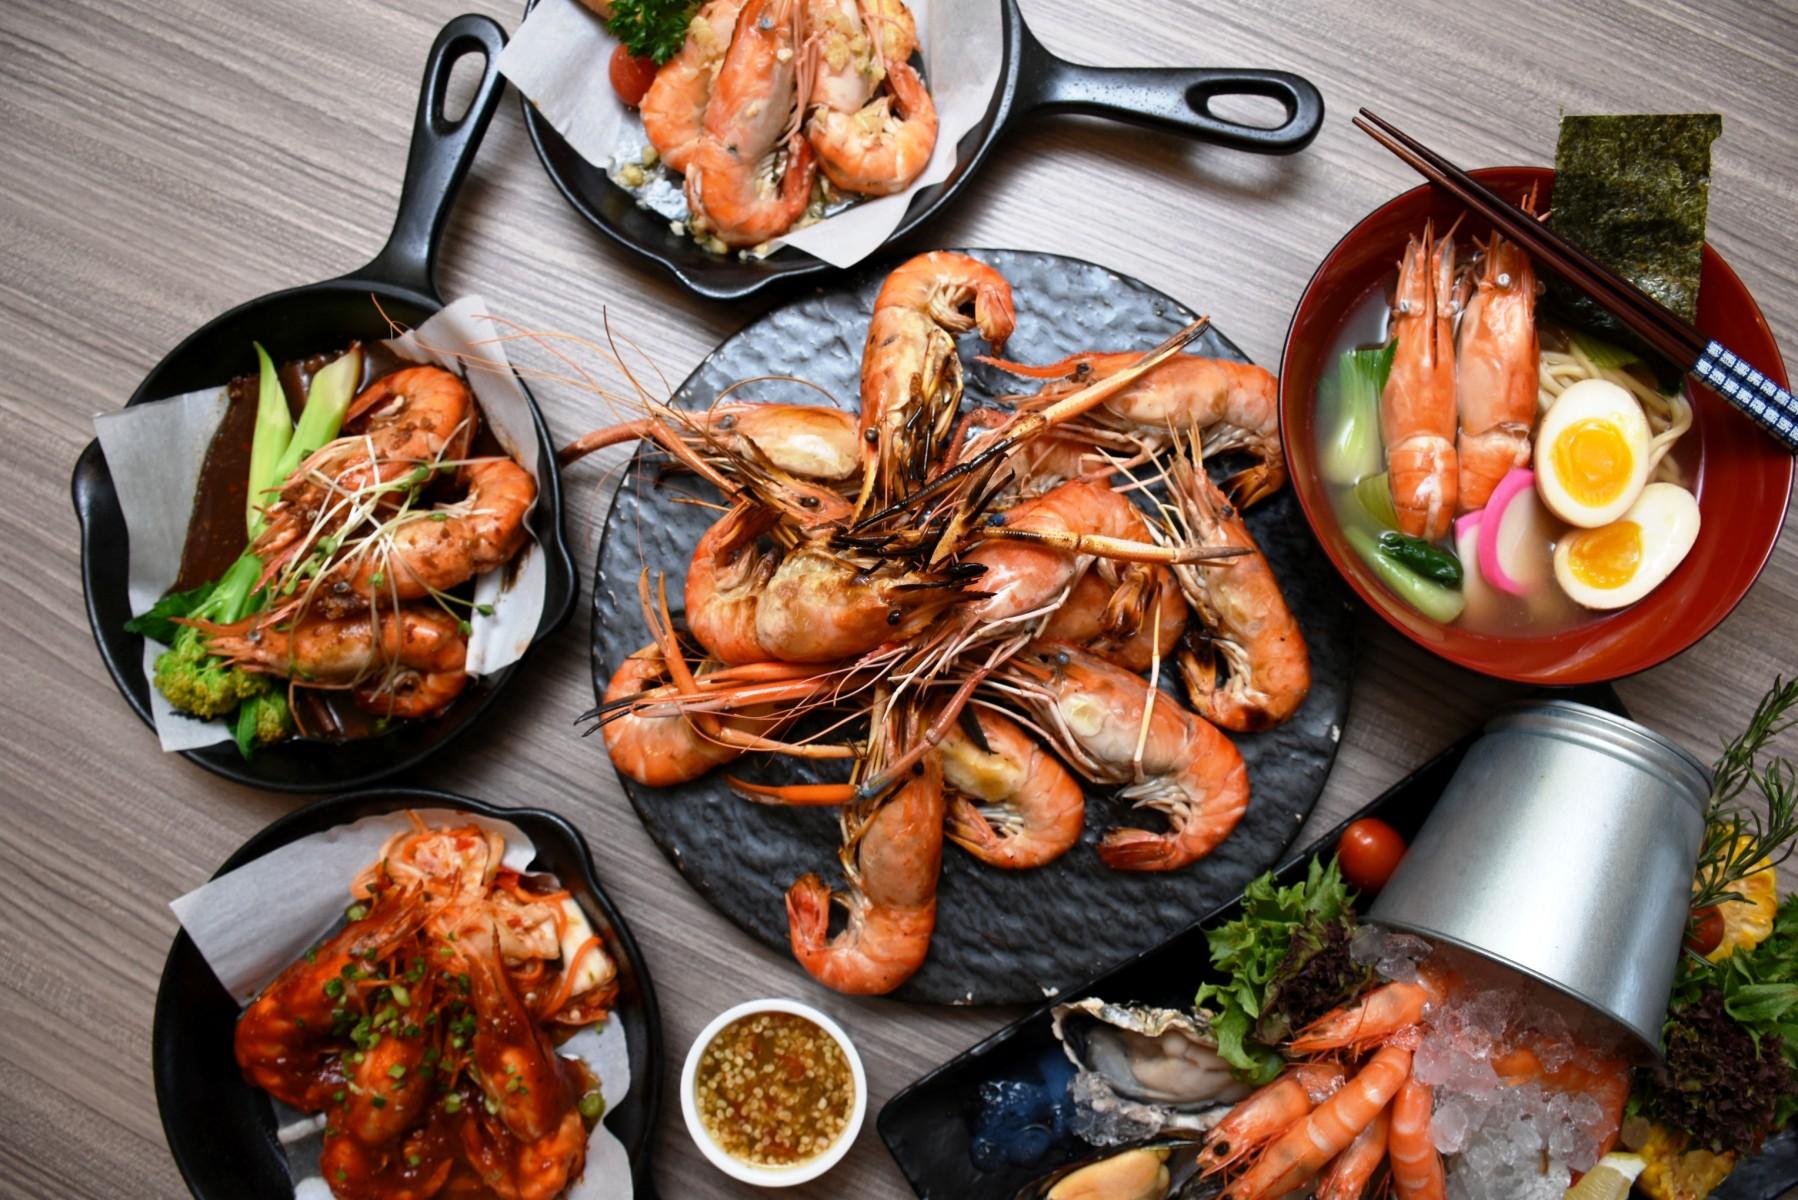 blue crab dinner buffet promotion